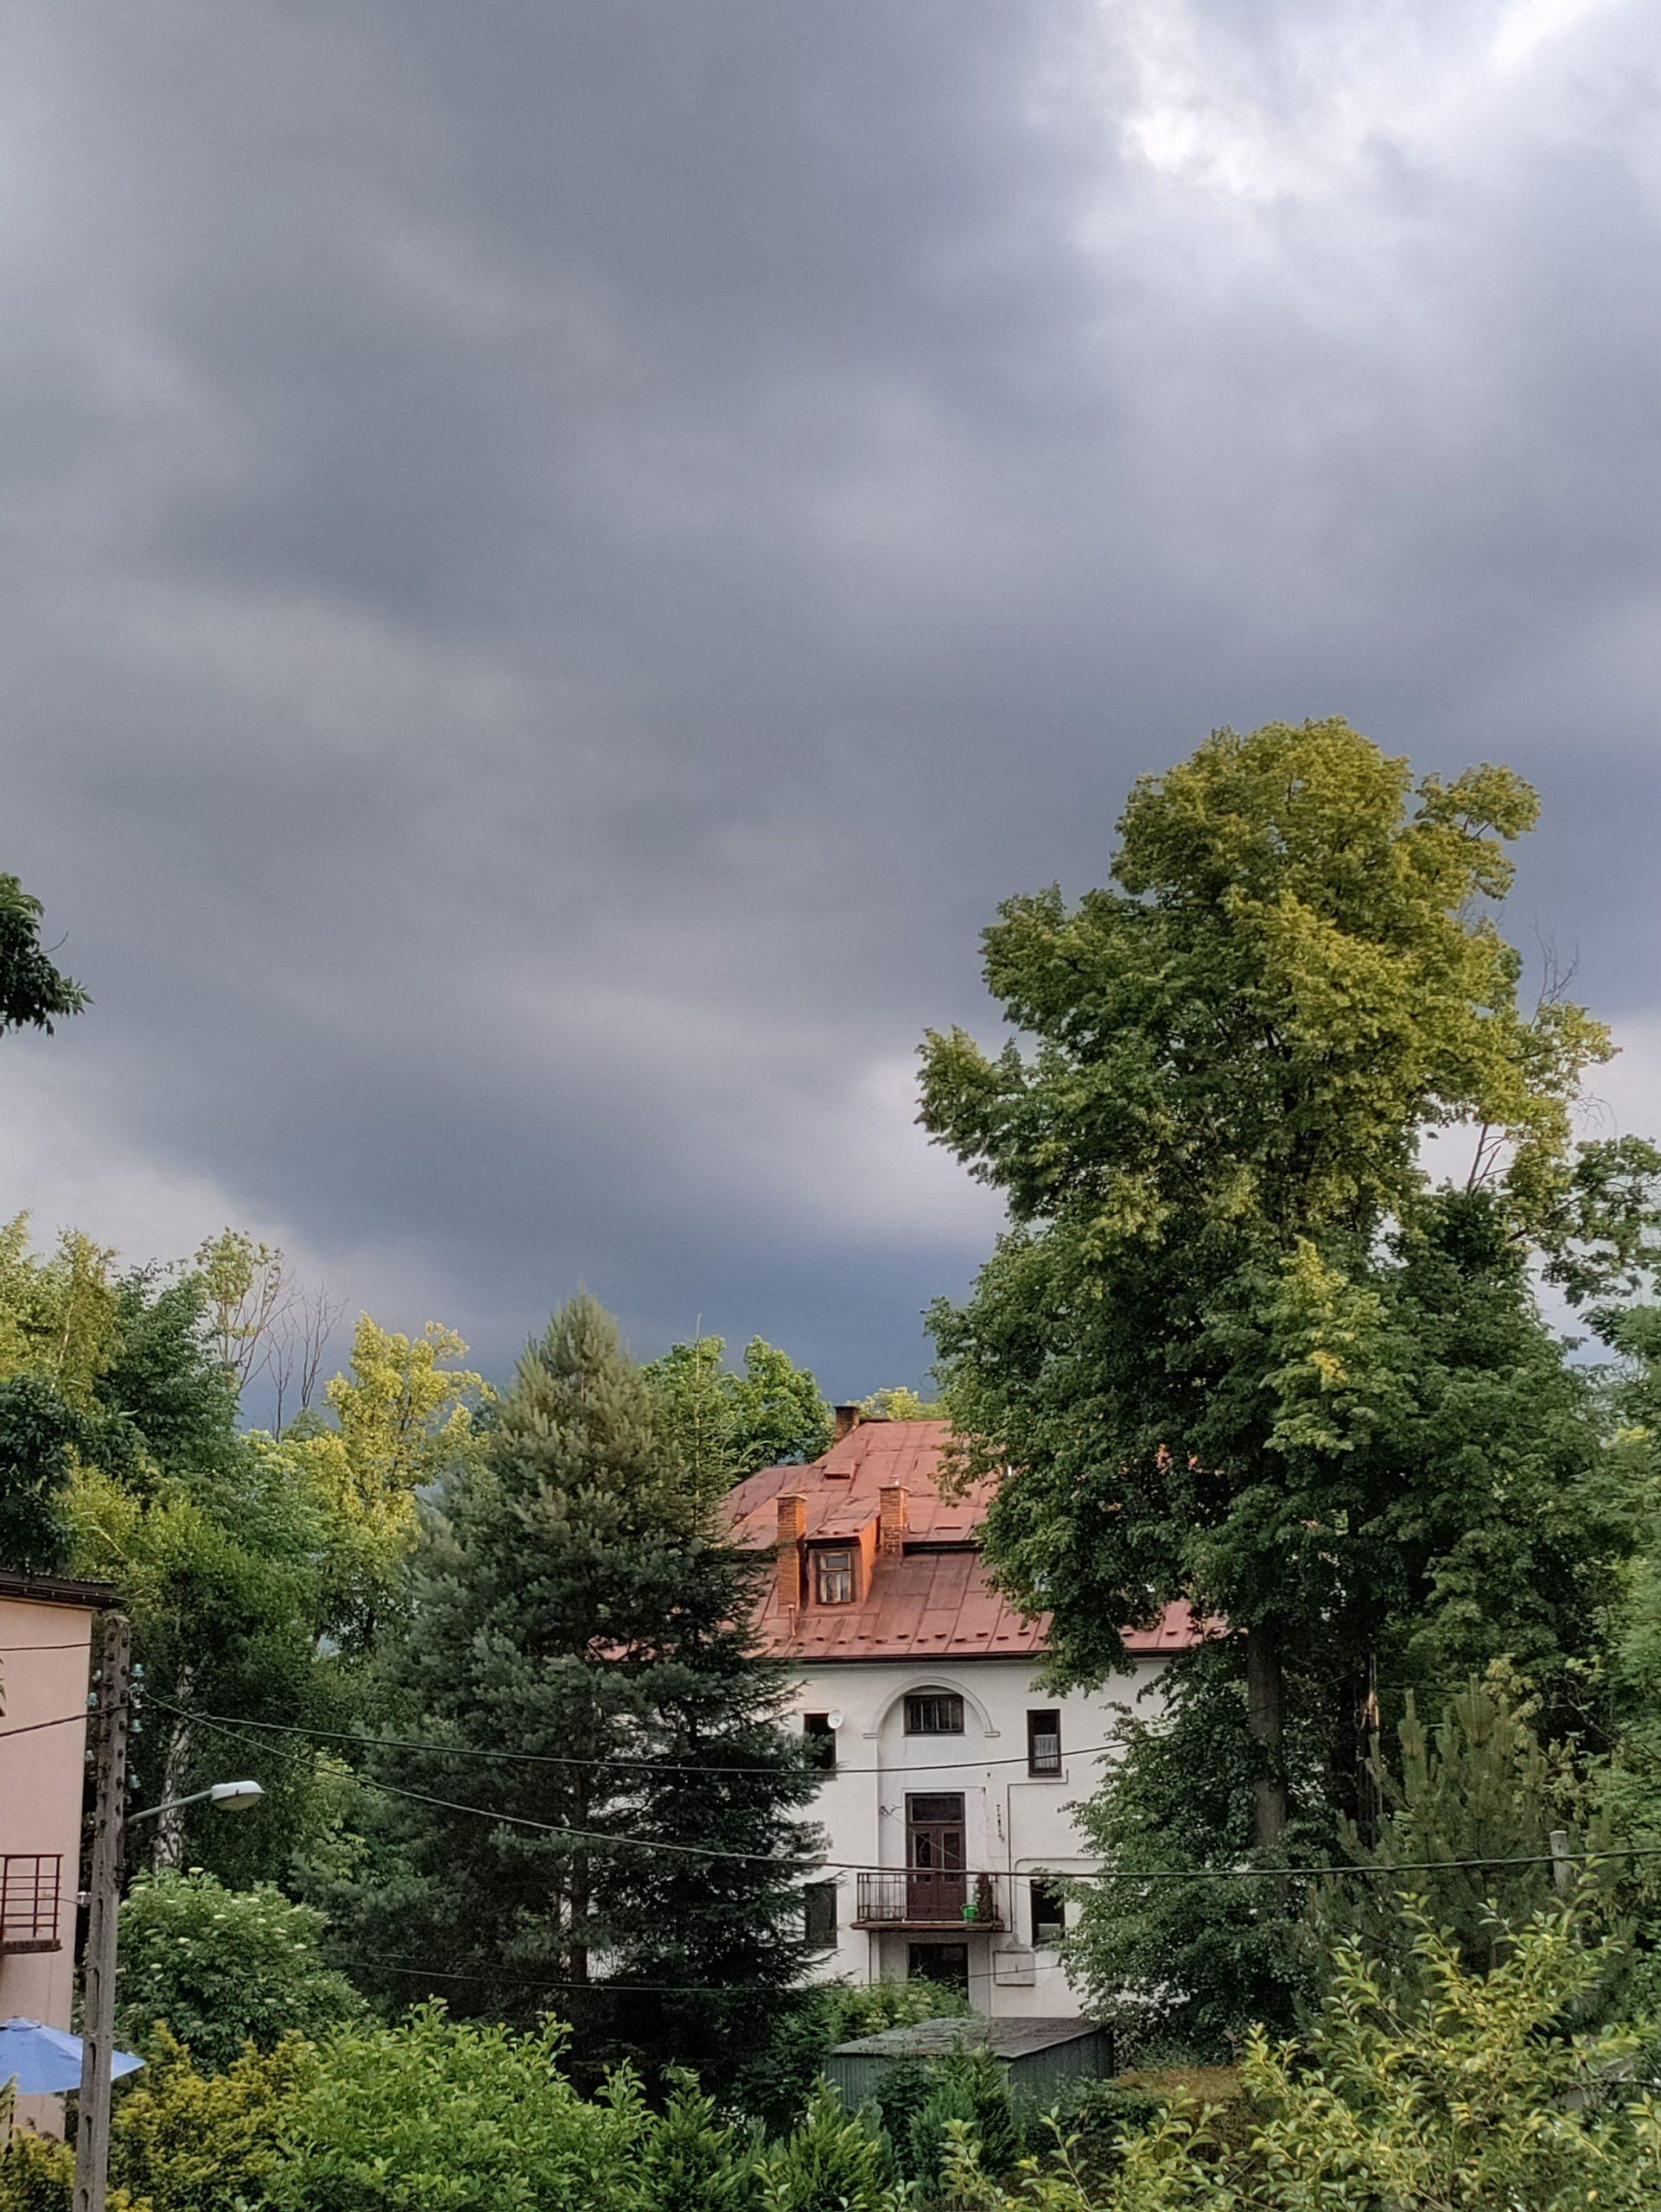 Nord CE 5G ciemne niebo